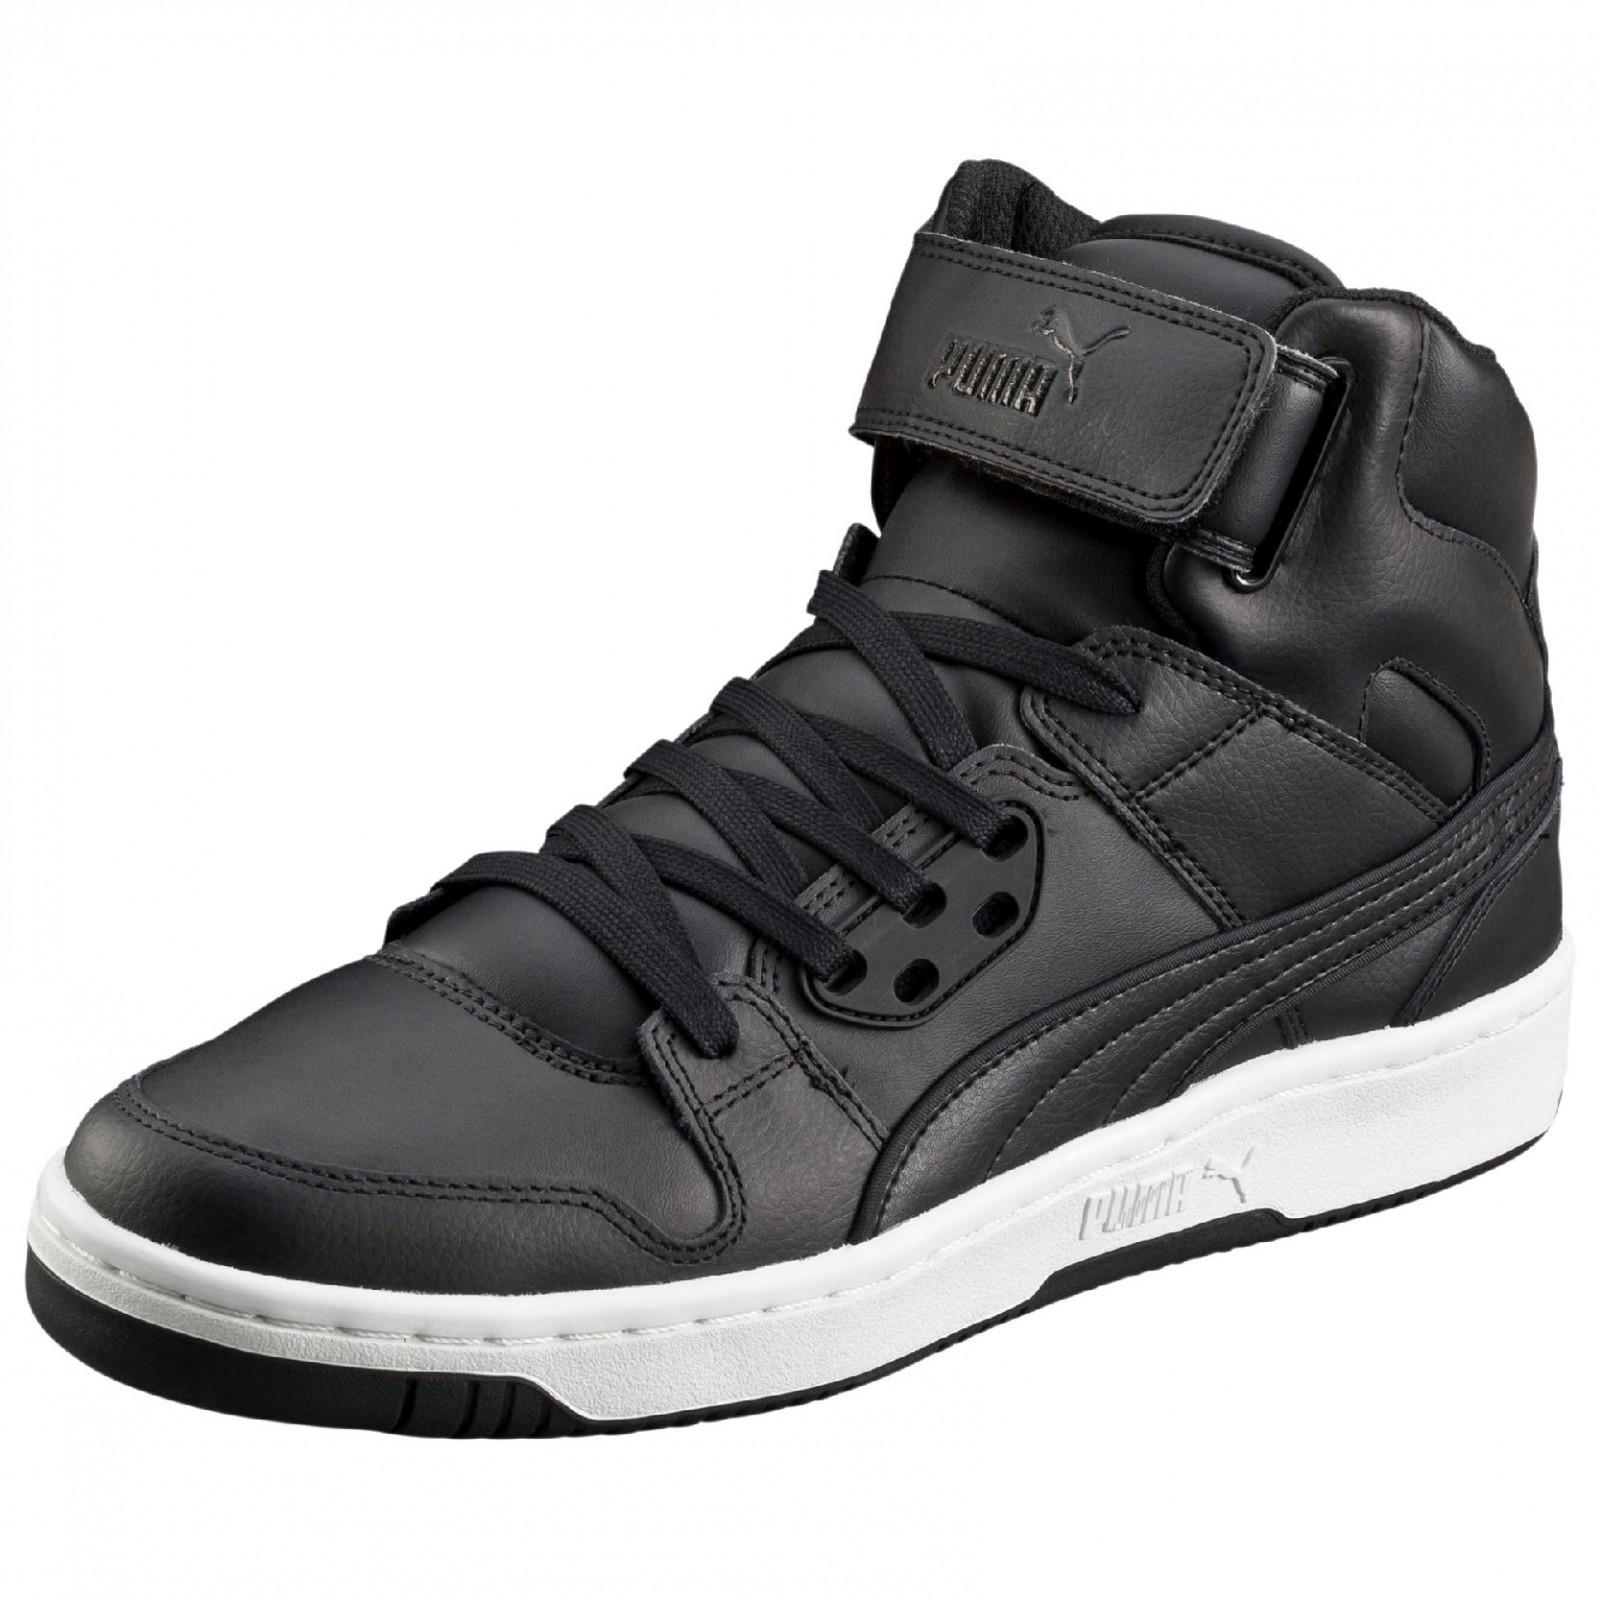 Dámské boty Puma Rebound Street L black-bl 9fec9425f1